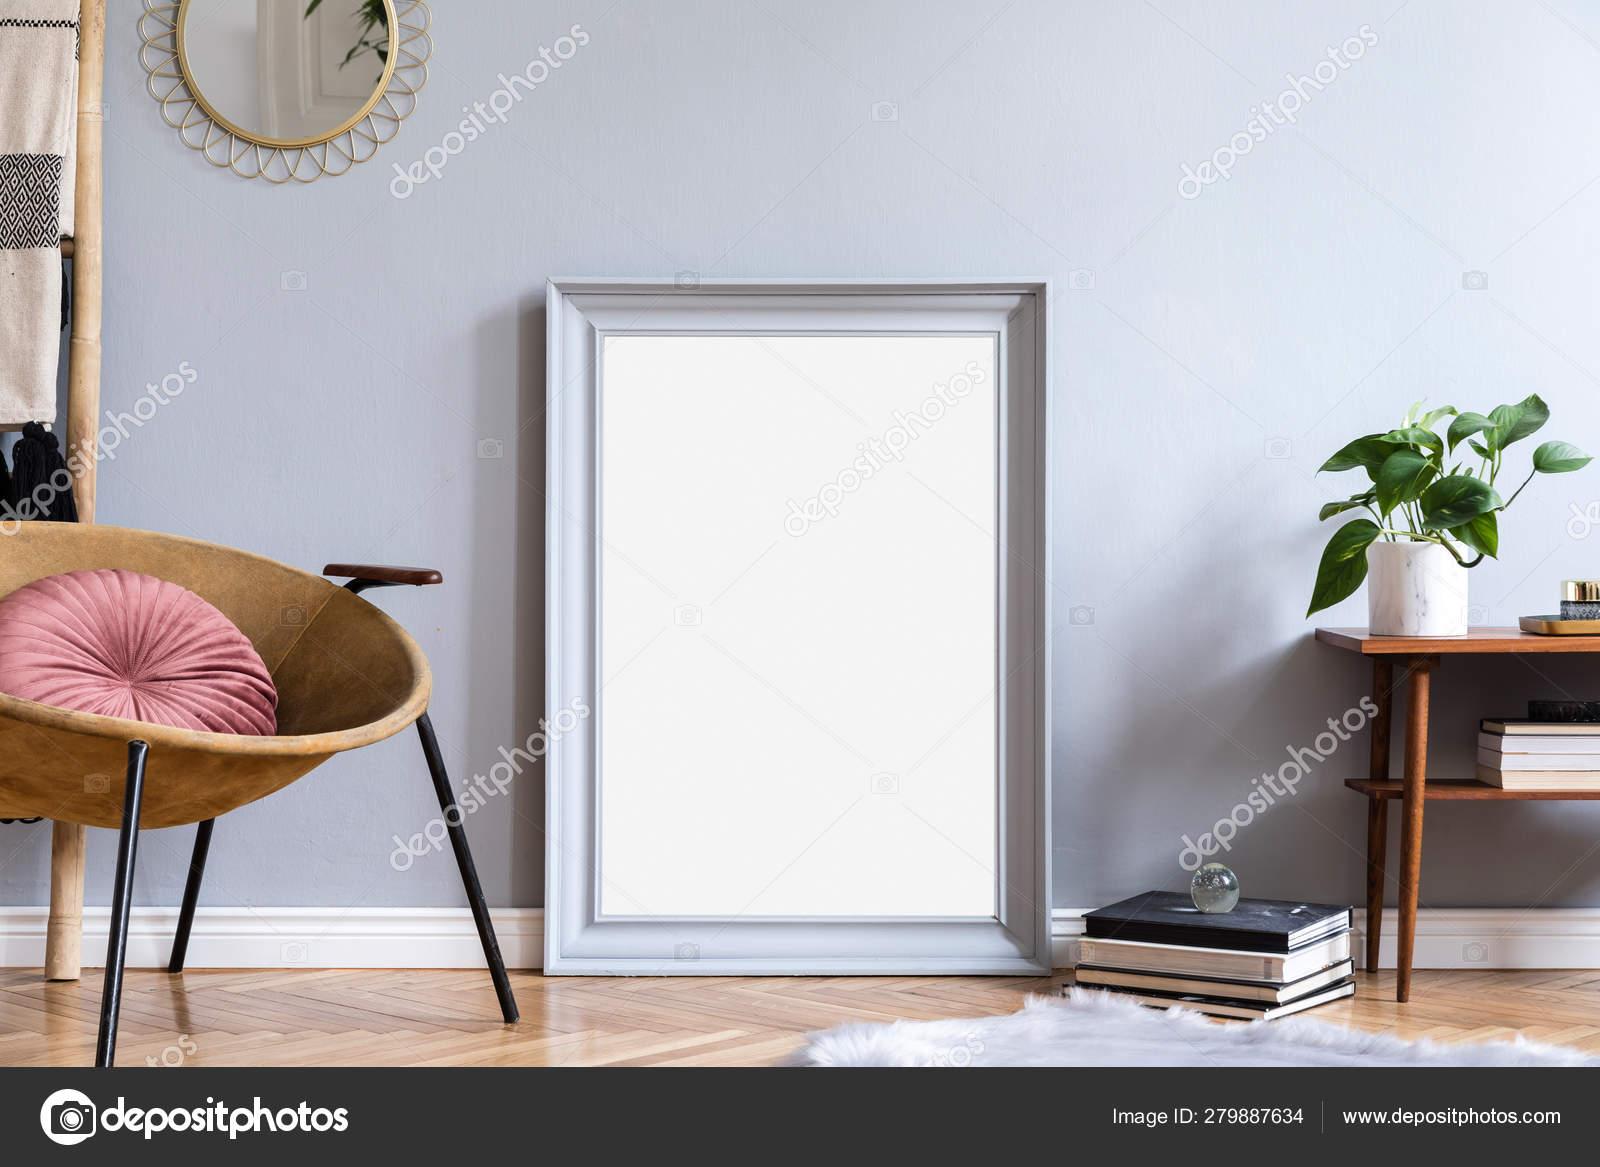 Stylish Luxury Interior Design Honey Yellow Armchair Gray Mock Frame Stock Photo Image By C Followtheflow 279887634